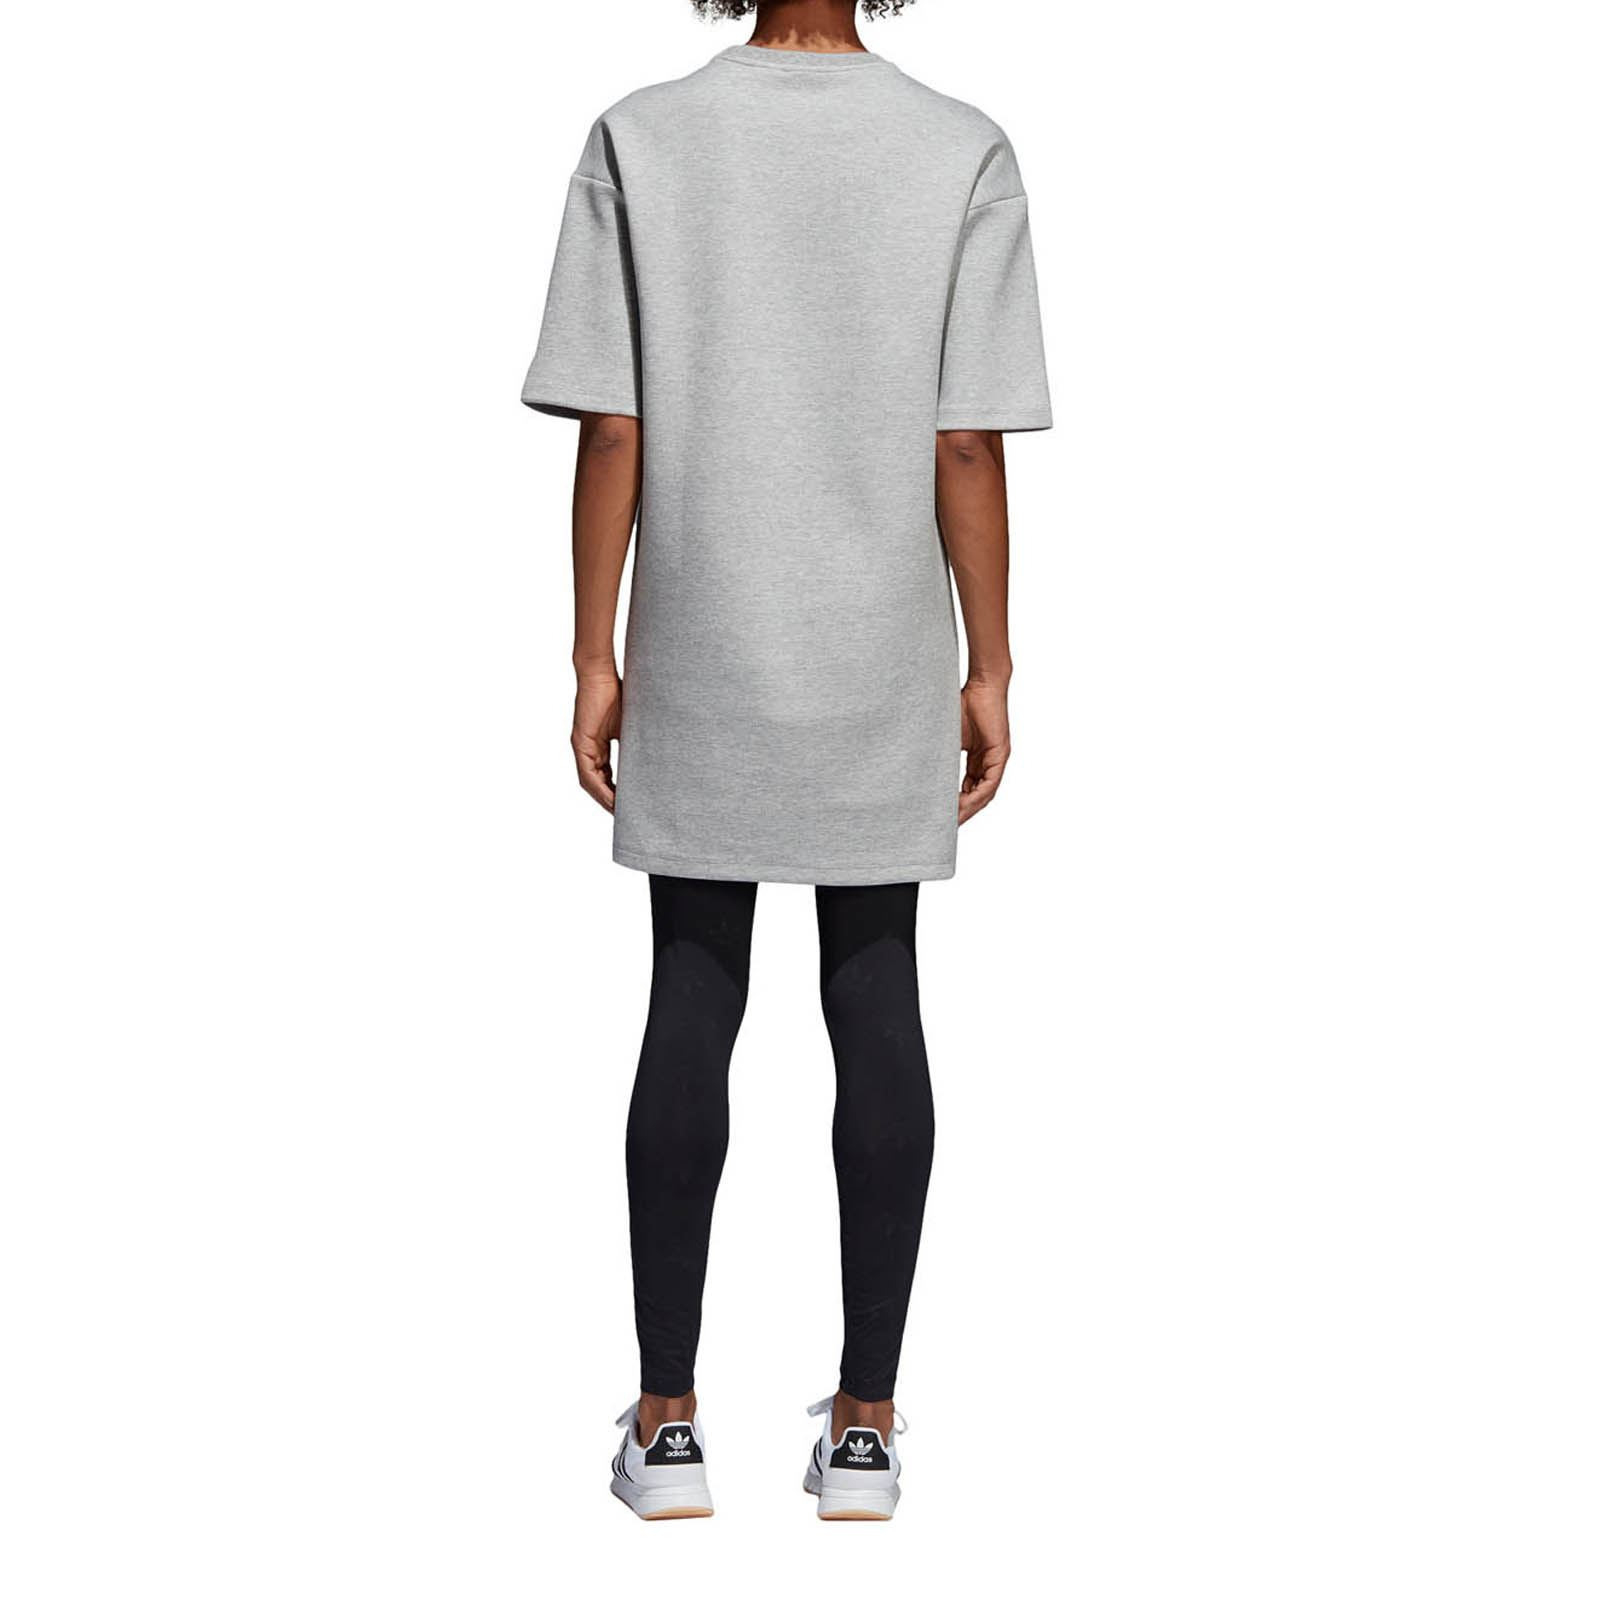 Adidas Originals Tshirtkleid  Grau  Brandalley